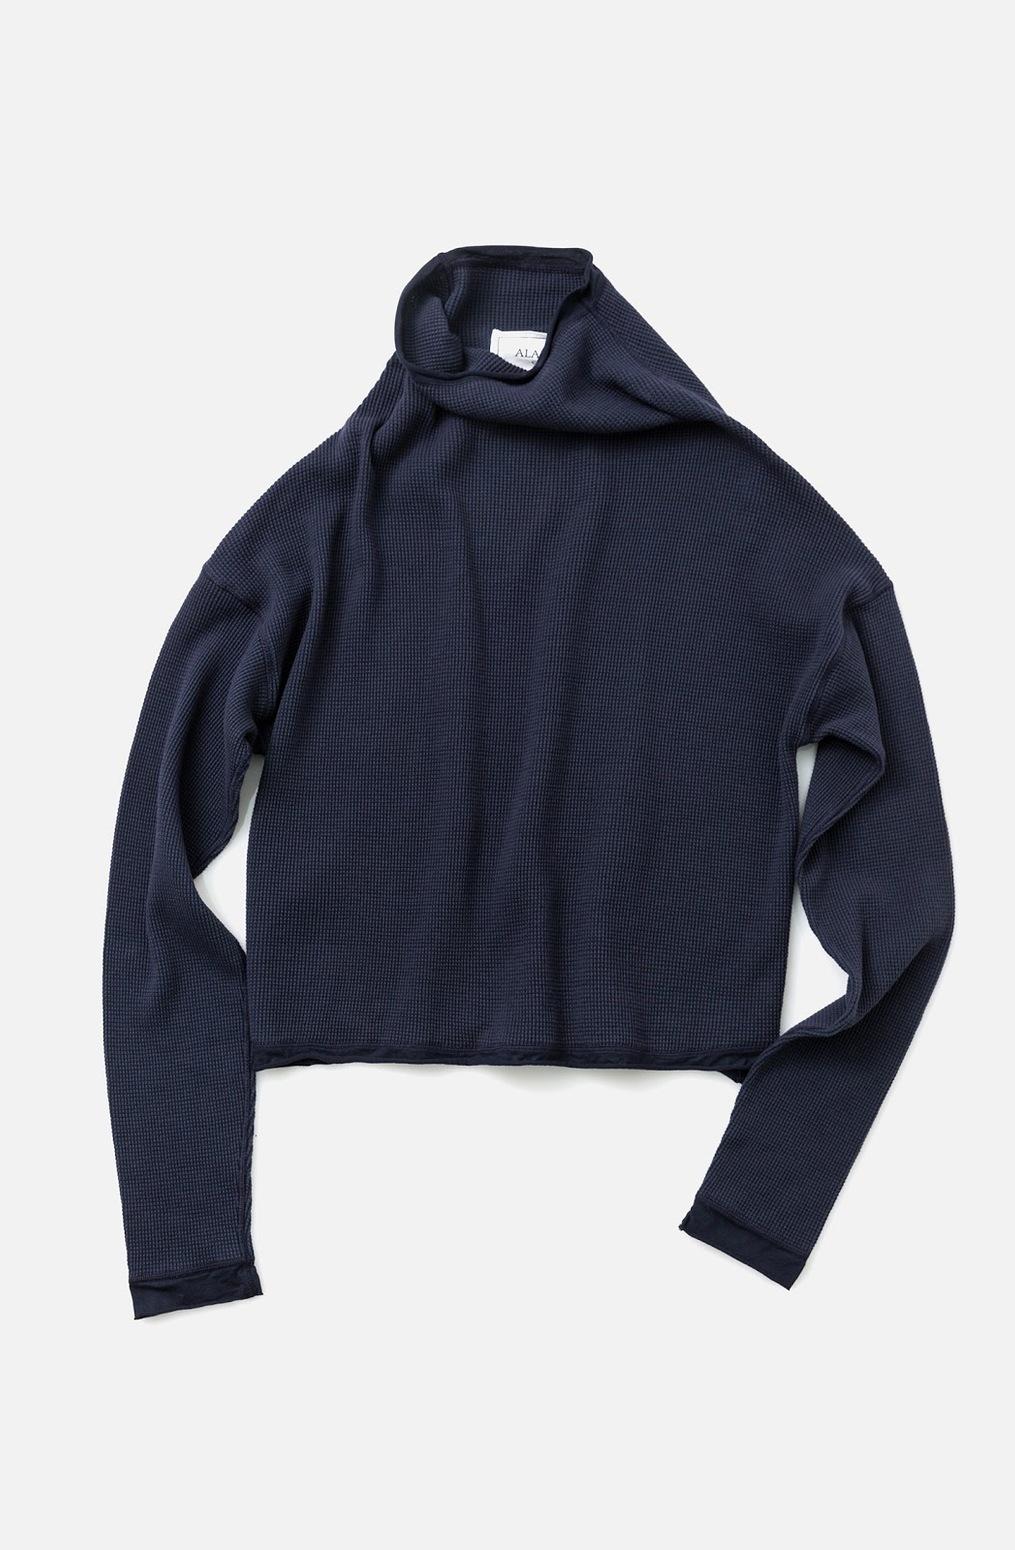 Alabama chanin waffle knit sweatshirt 2